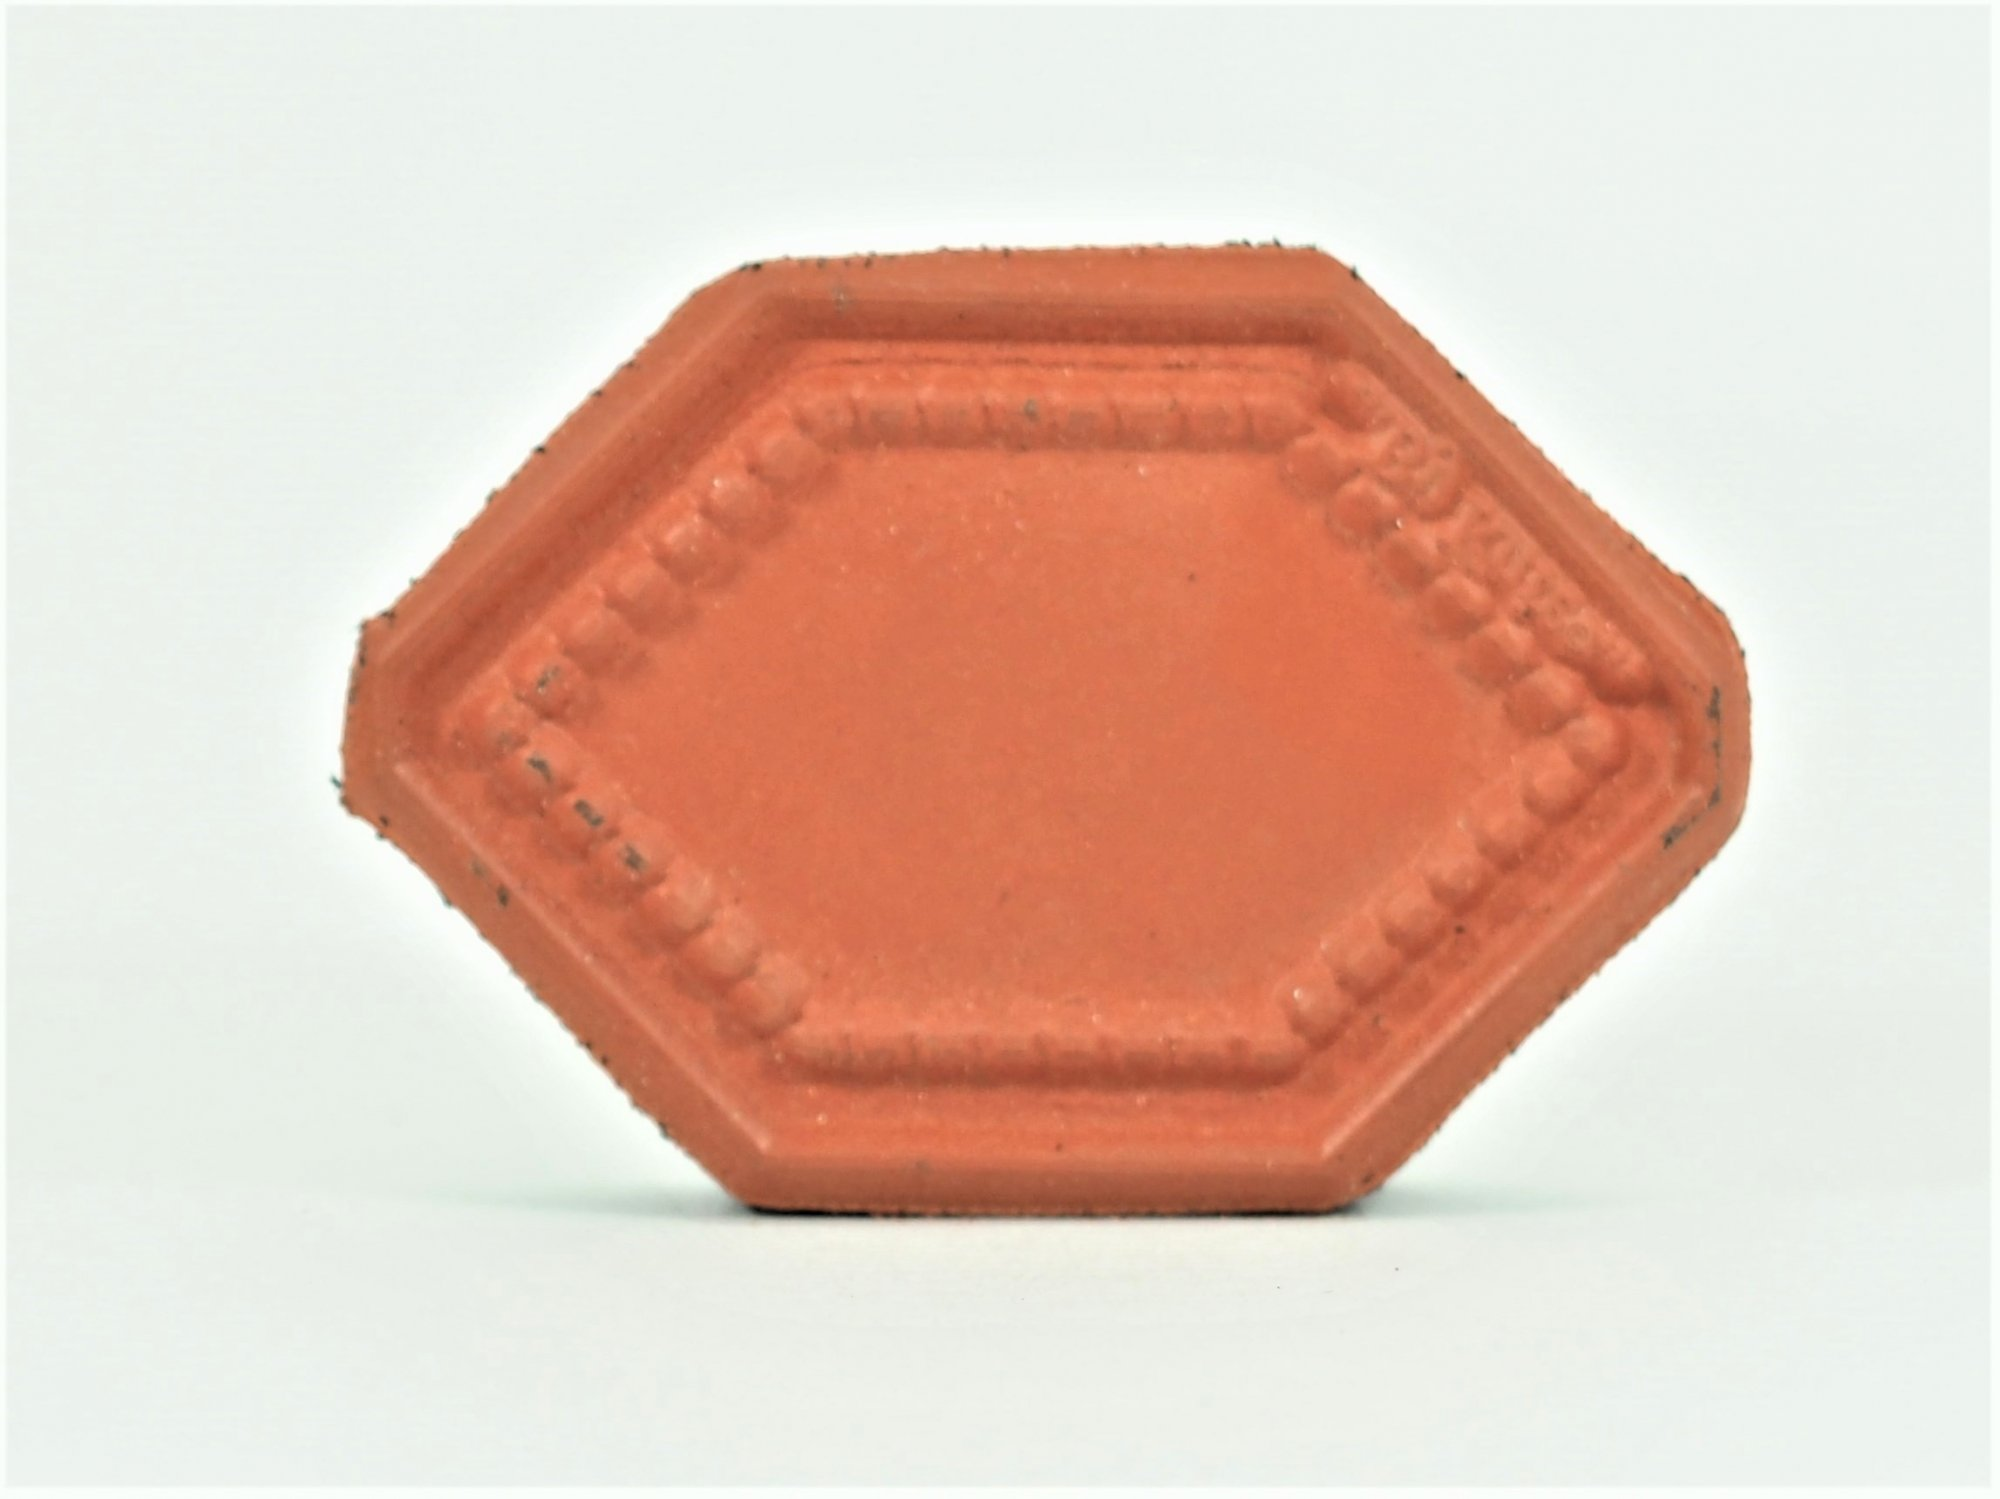 Hexagon Long Stamp/Honeycomb - 1 inch long